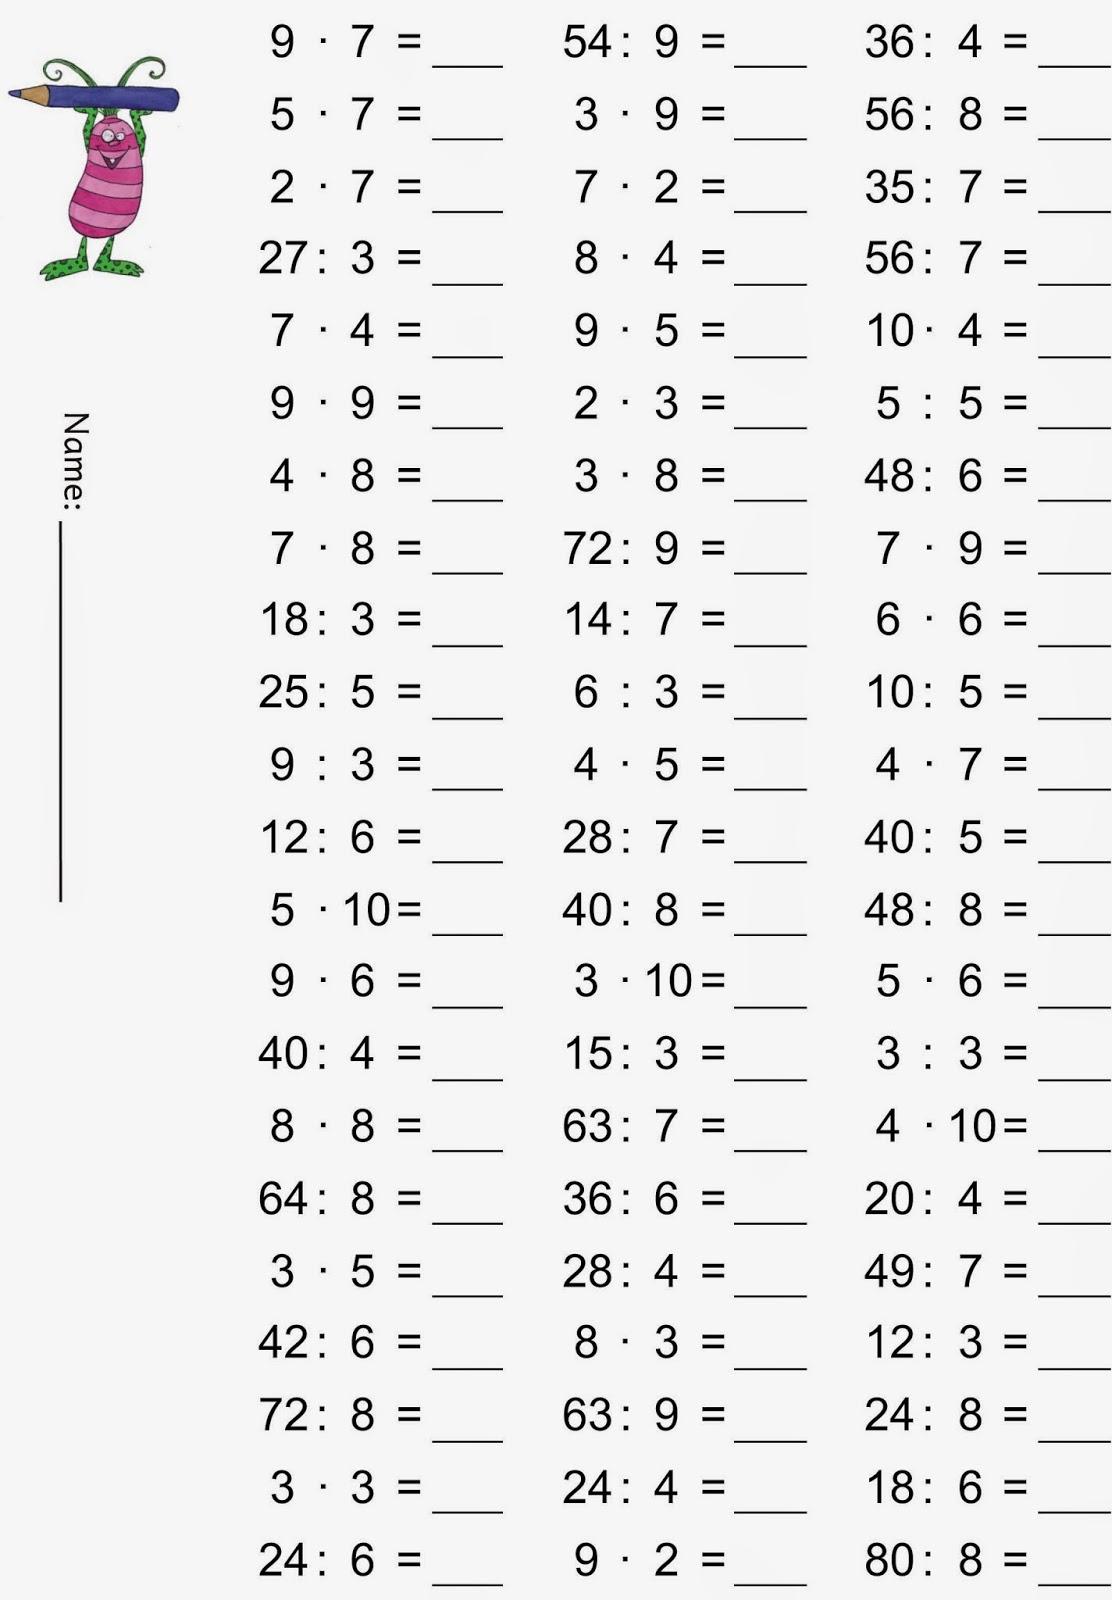 Kopfrechenaufgaben klasse